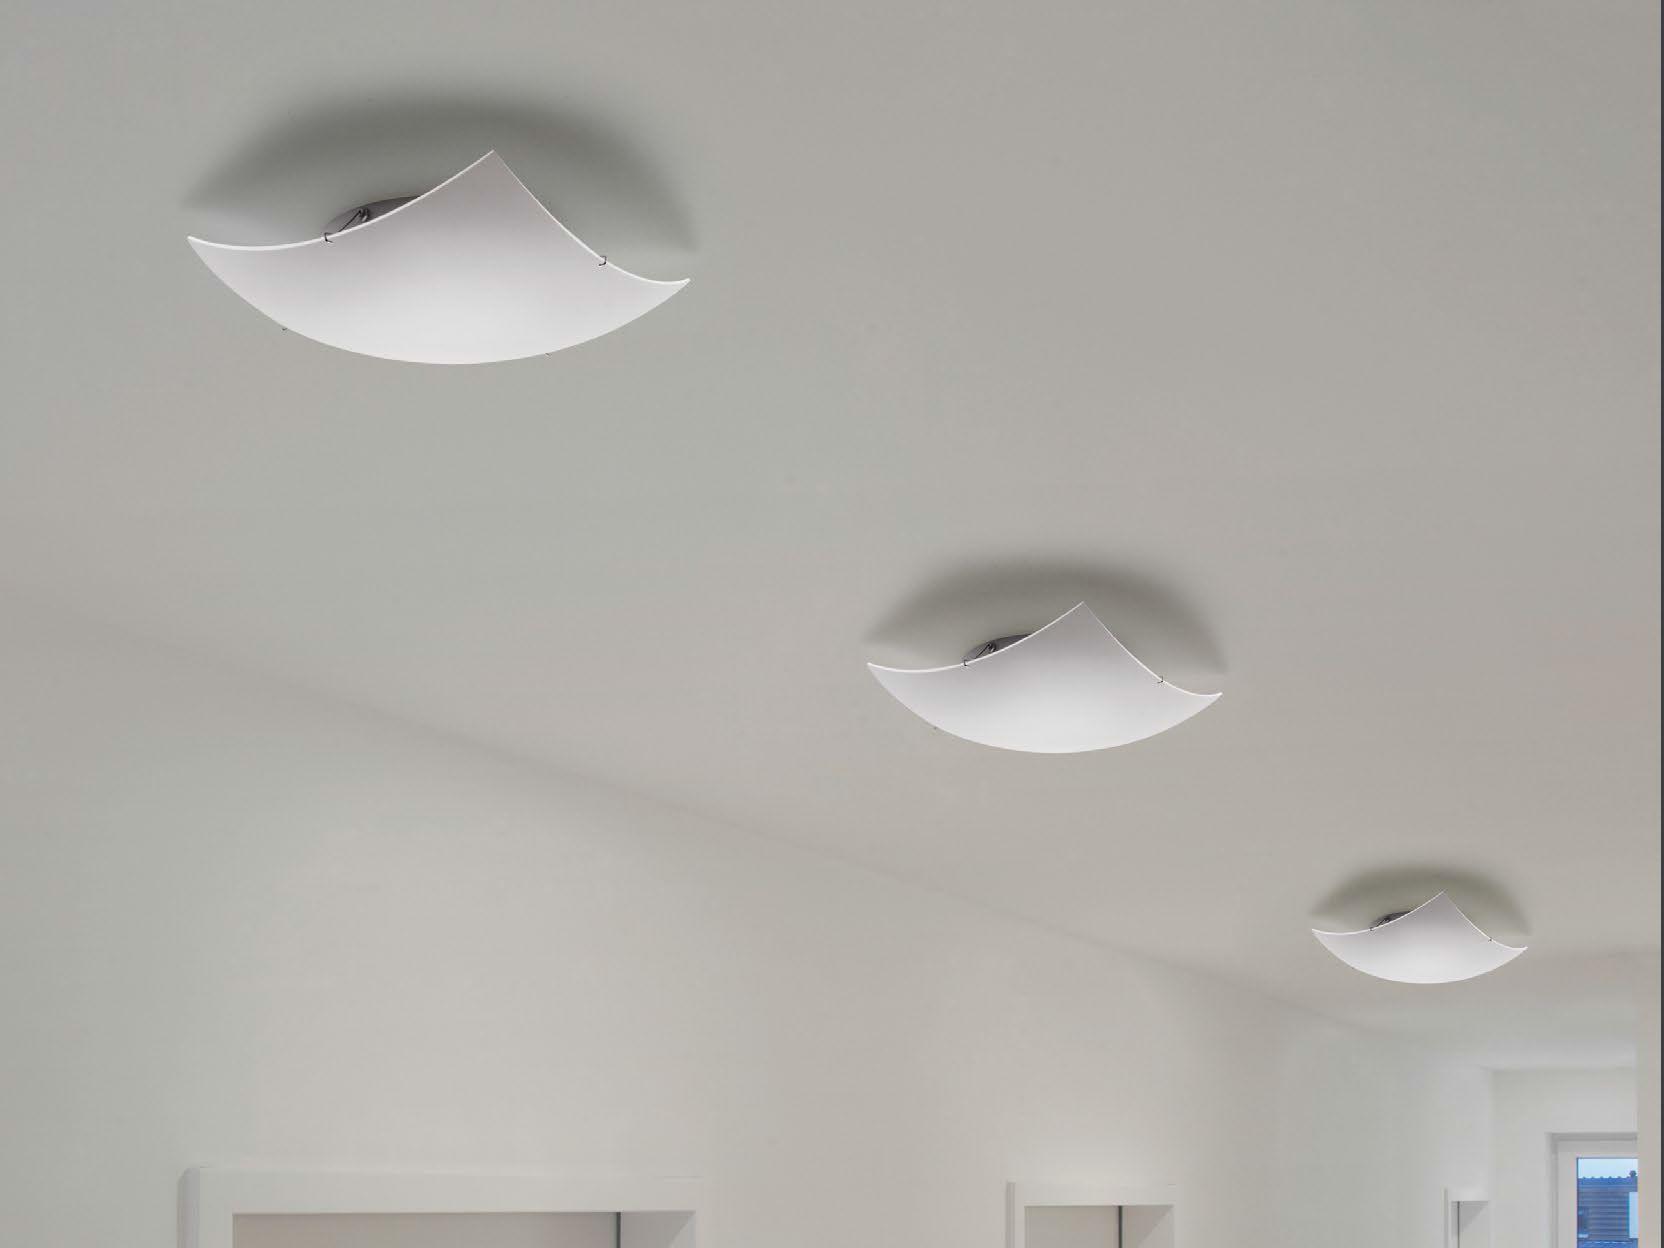 Moderne Lampen 76 : Treibholz lampen treibholz möbel holz lampen diy lampen